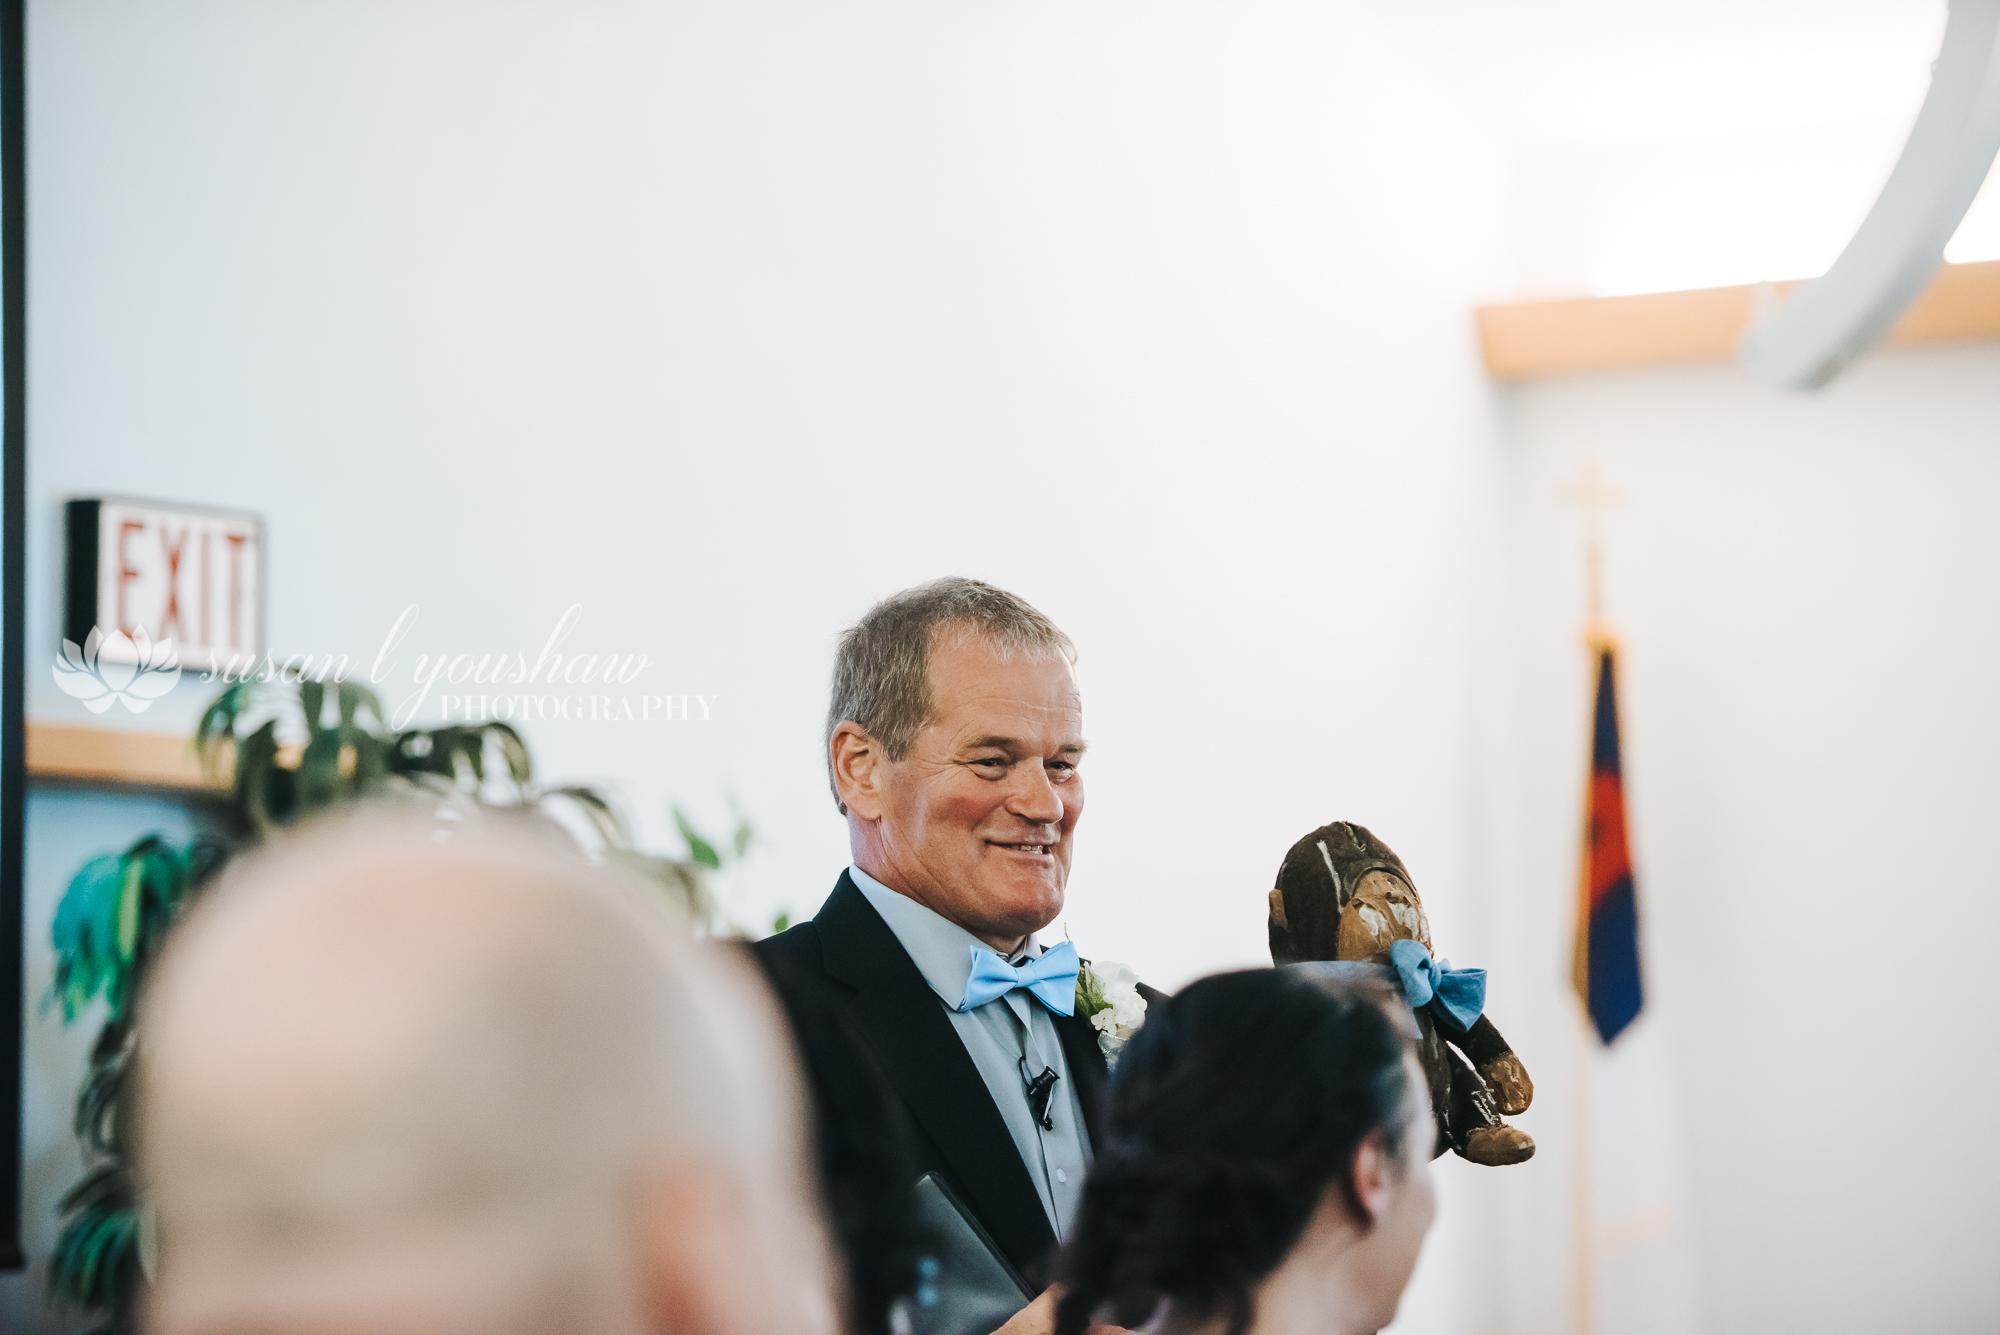 Katelyn and Wes Wedding Photos 07-13-2019 SLY Photography-60.jpg